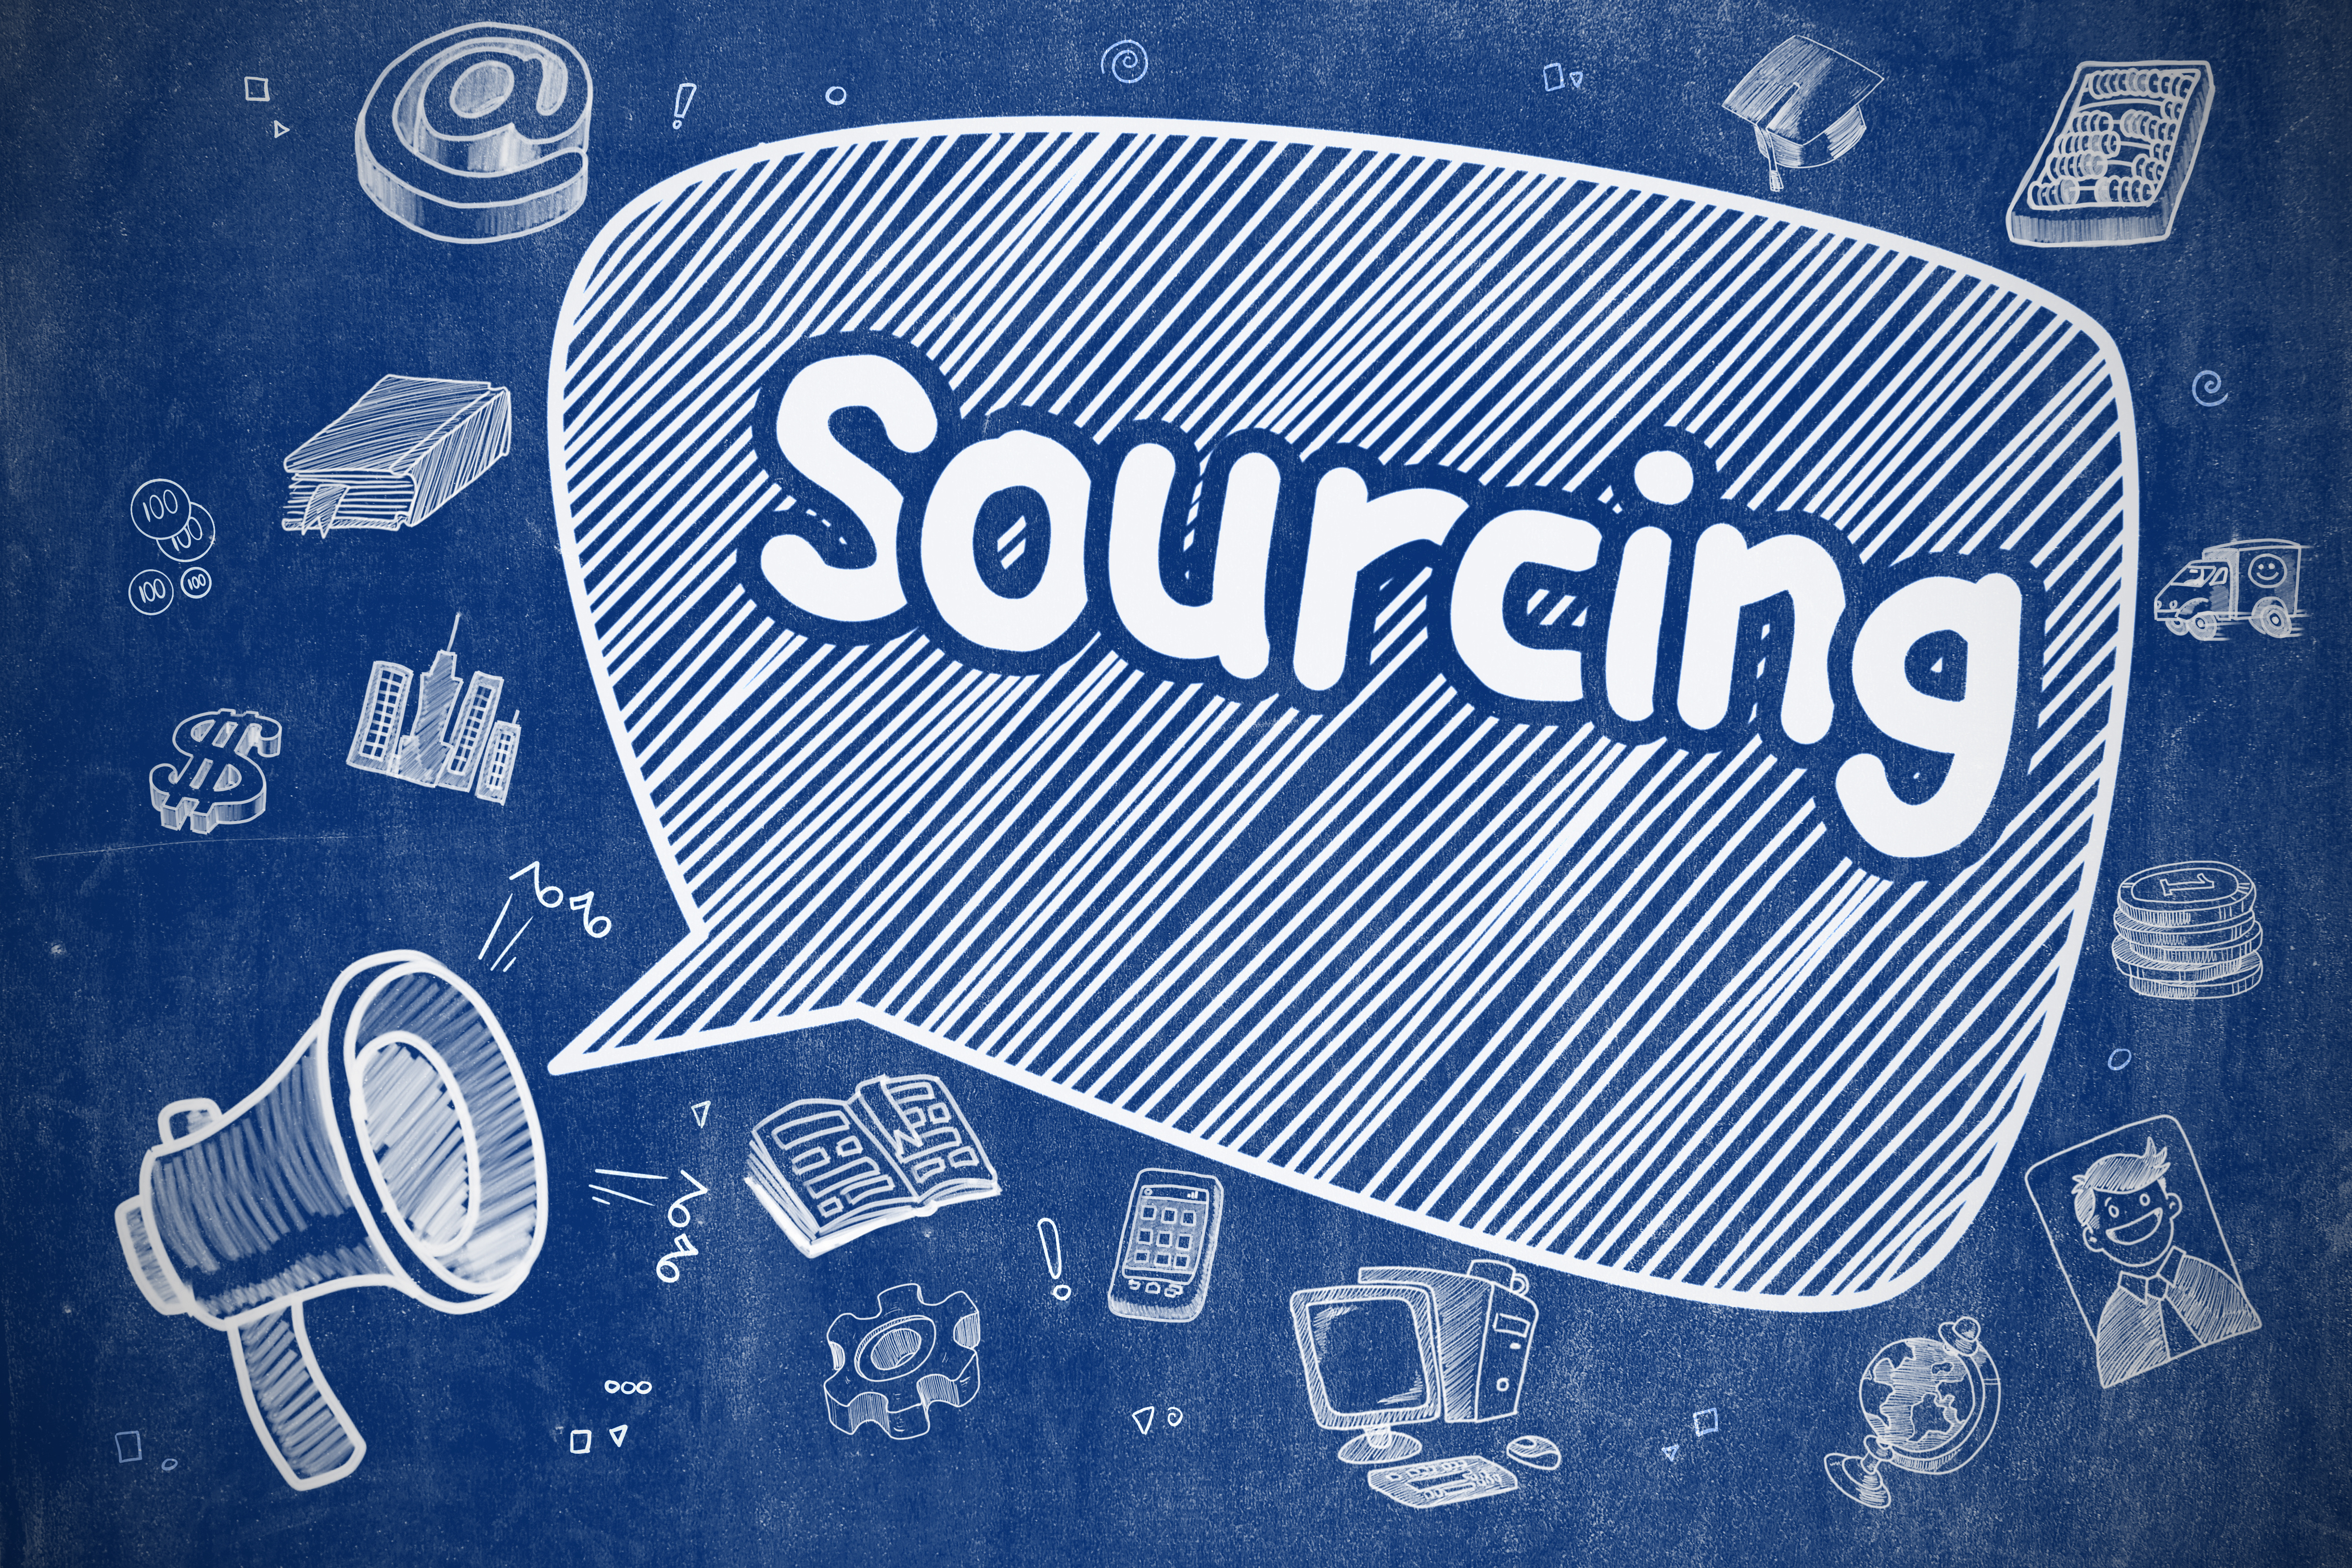 Sourcing Innovation